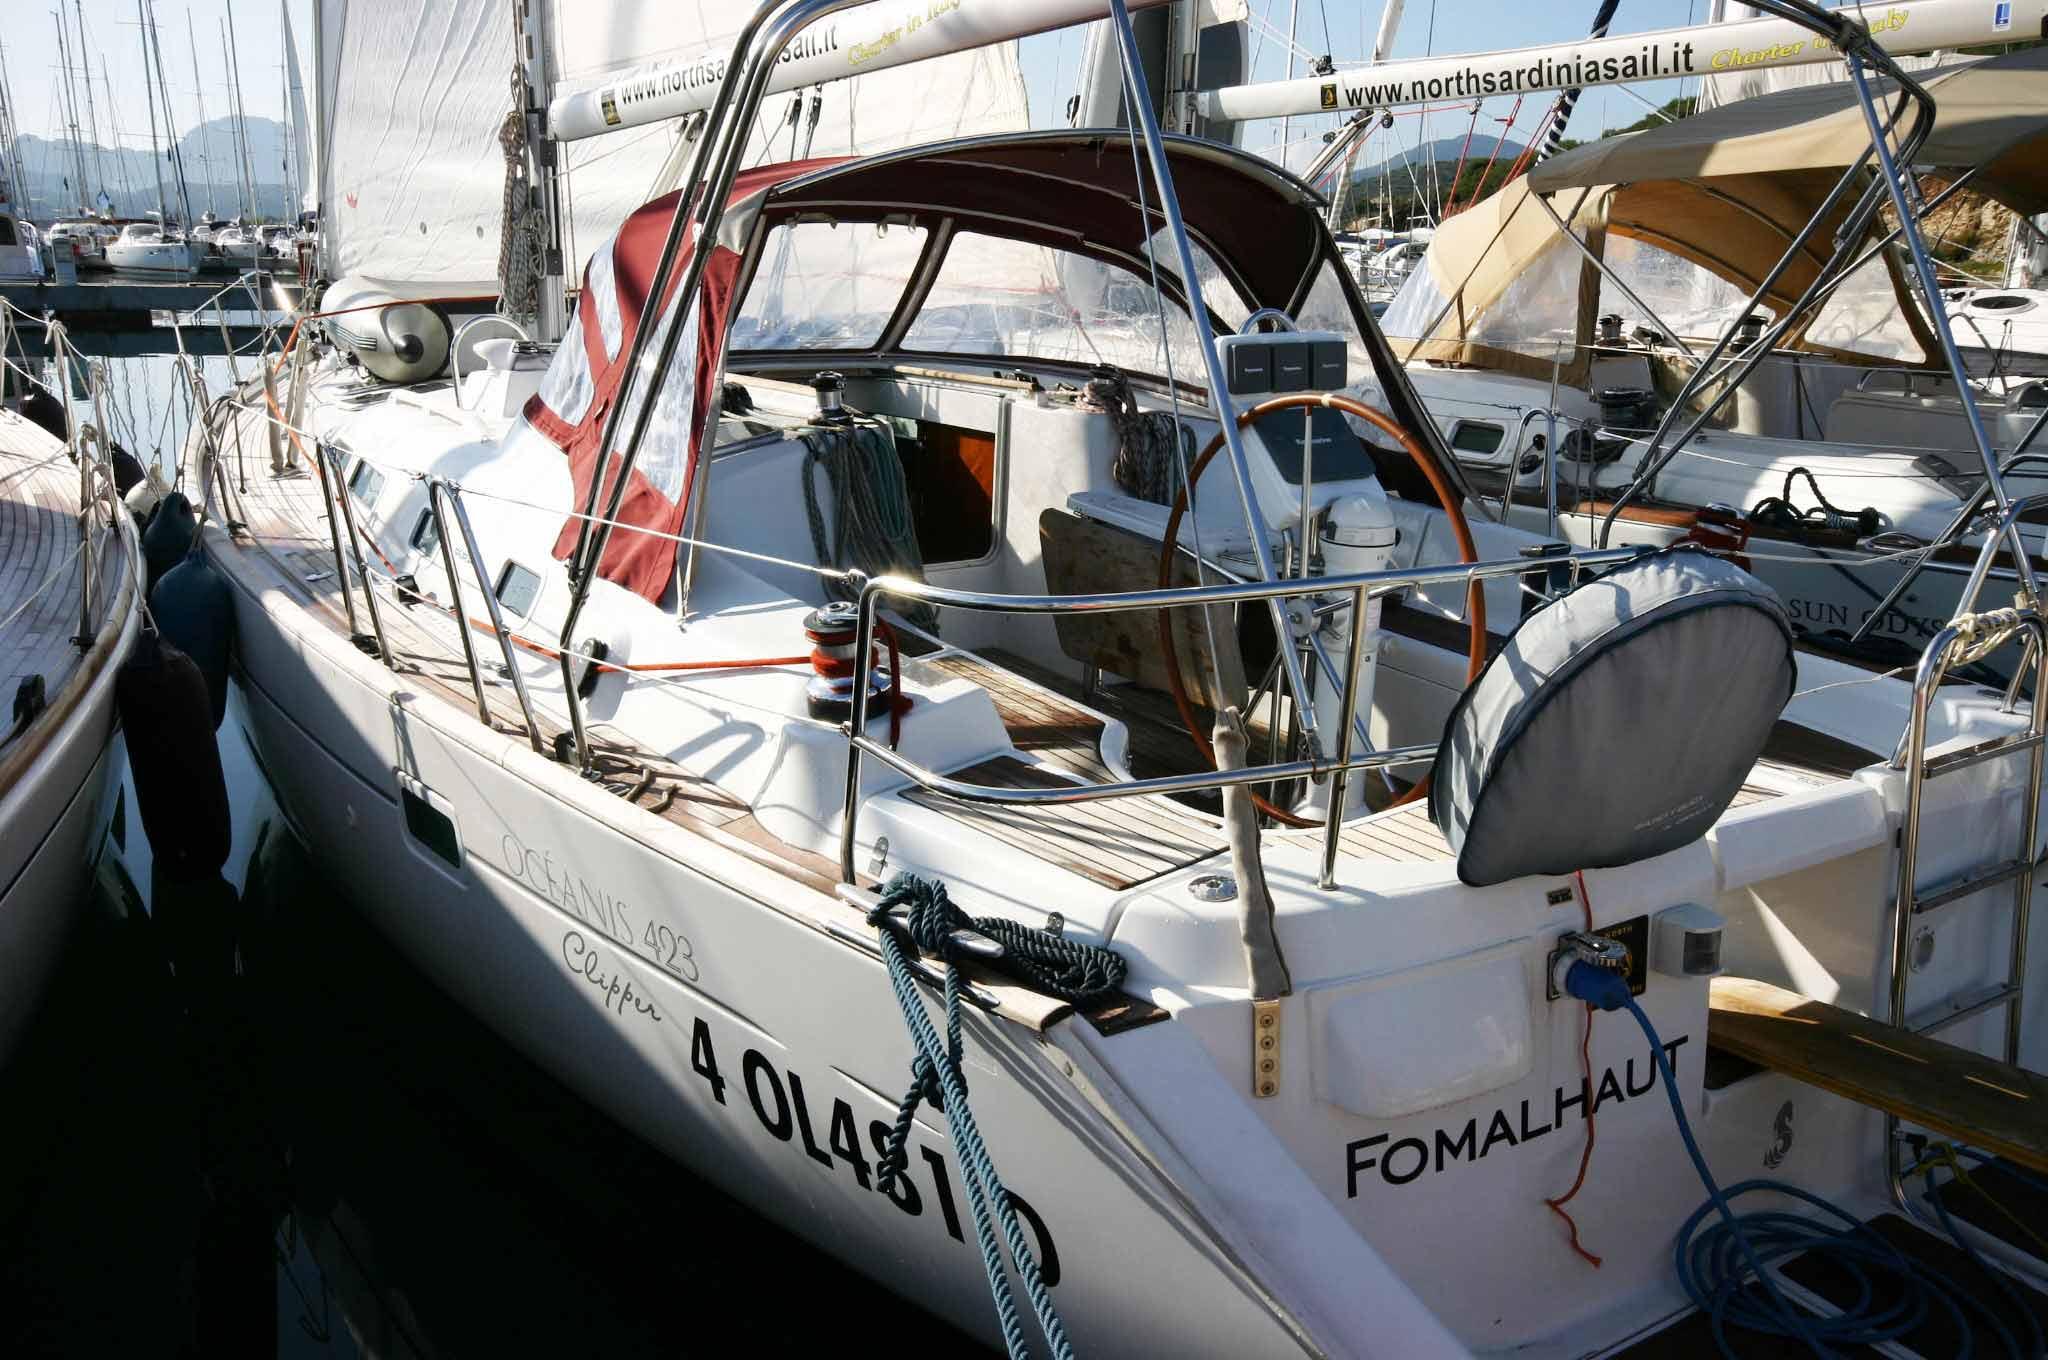 Oceanis Clipper 423 (Fomalhaut)